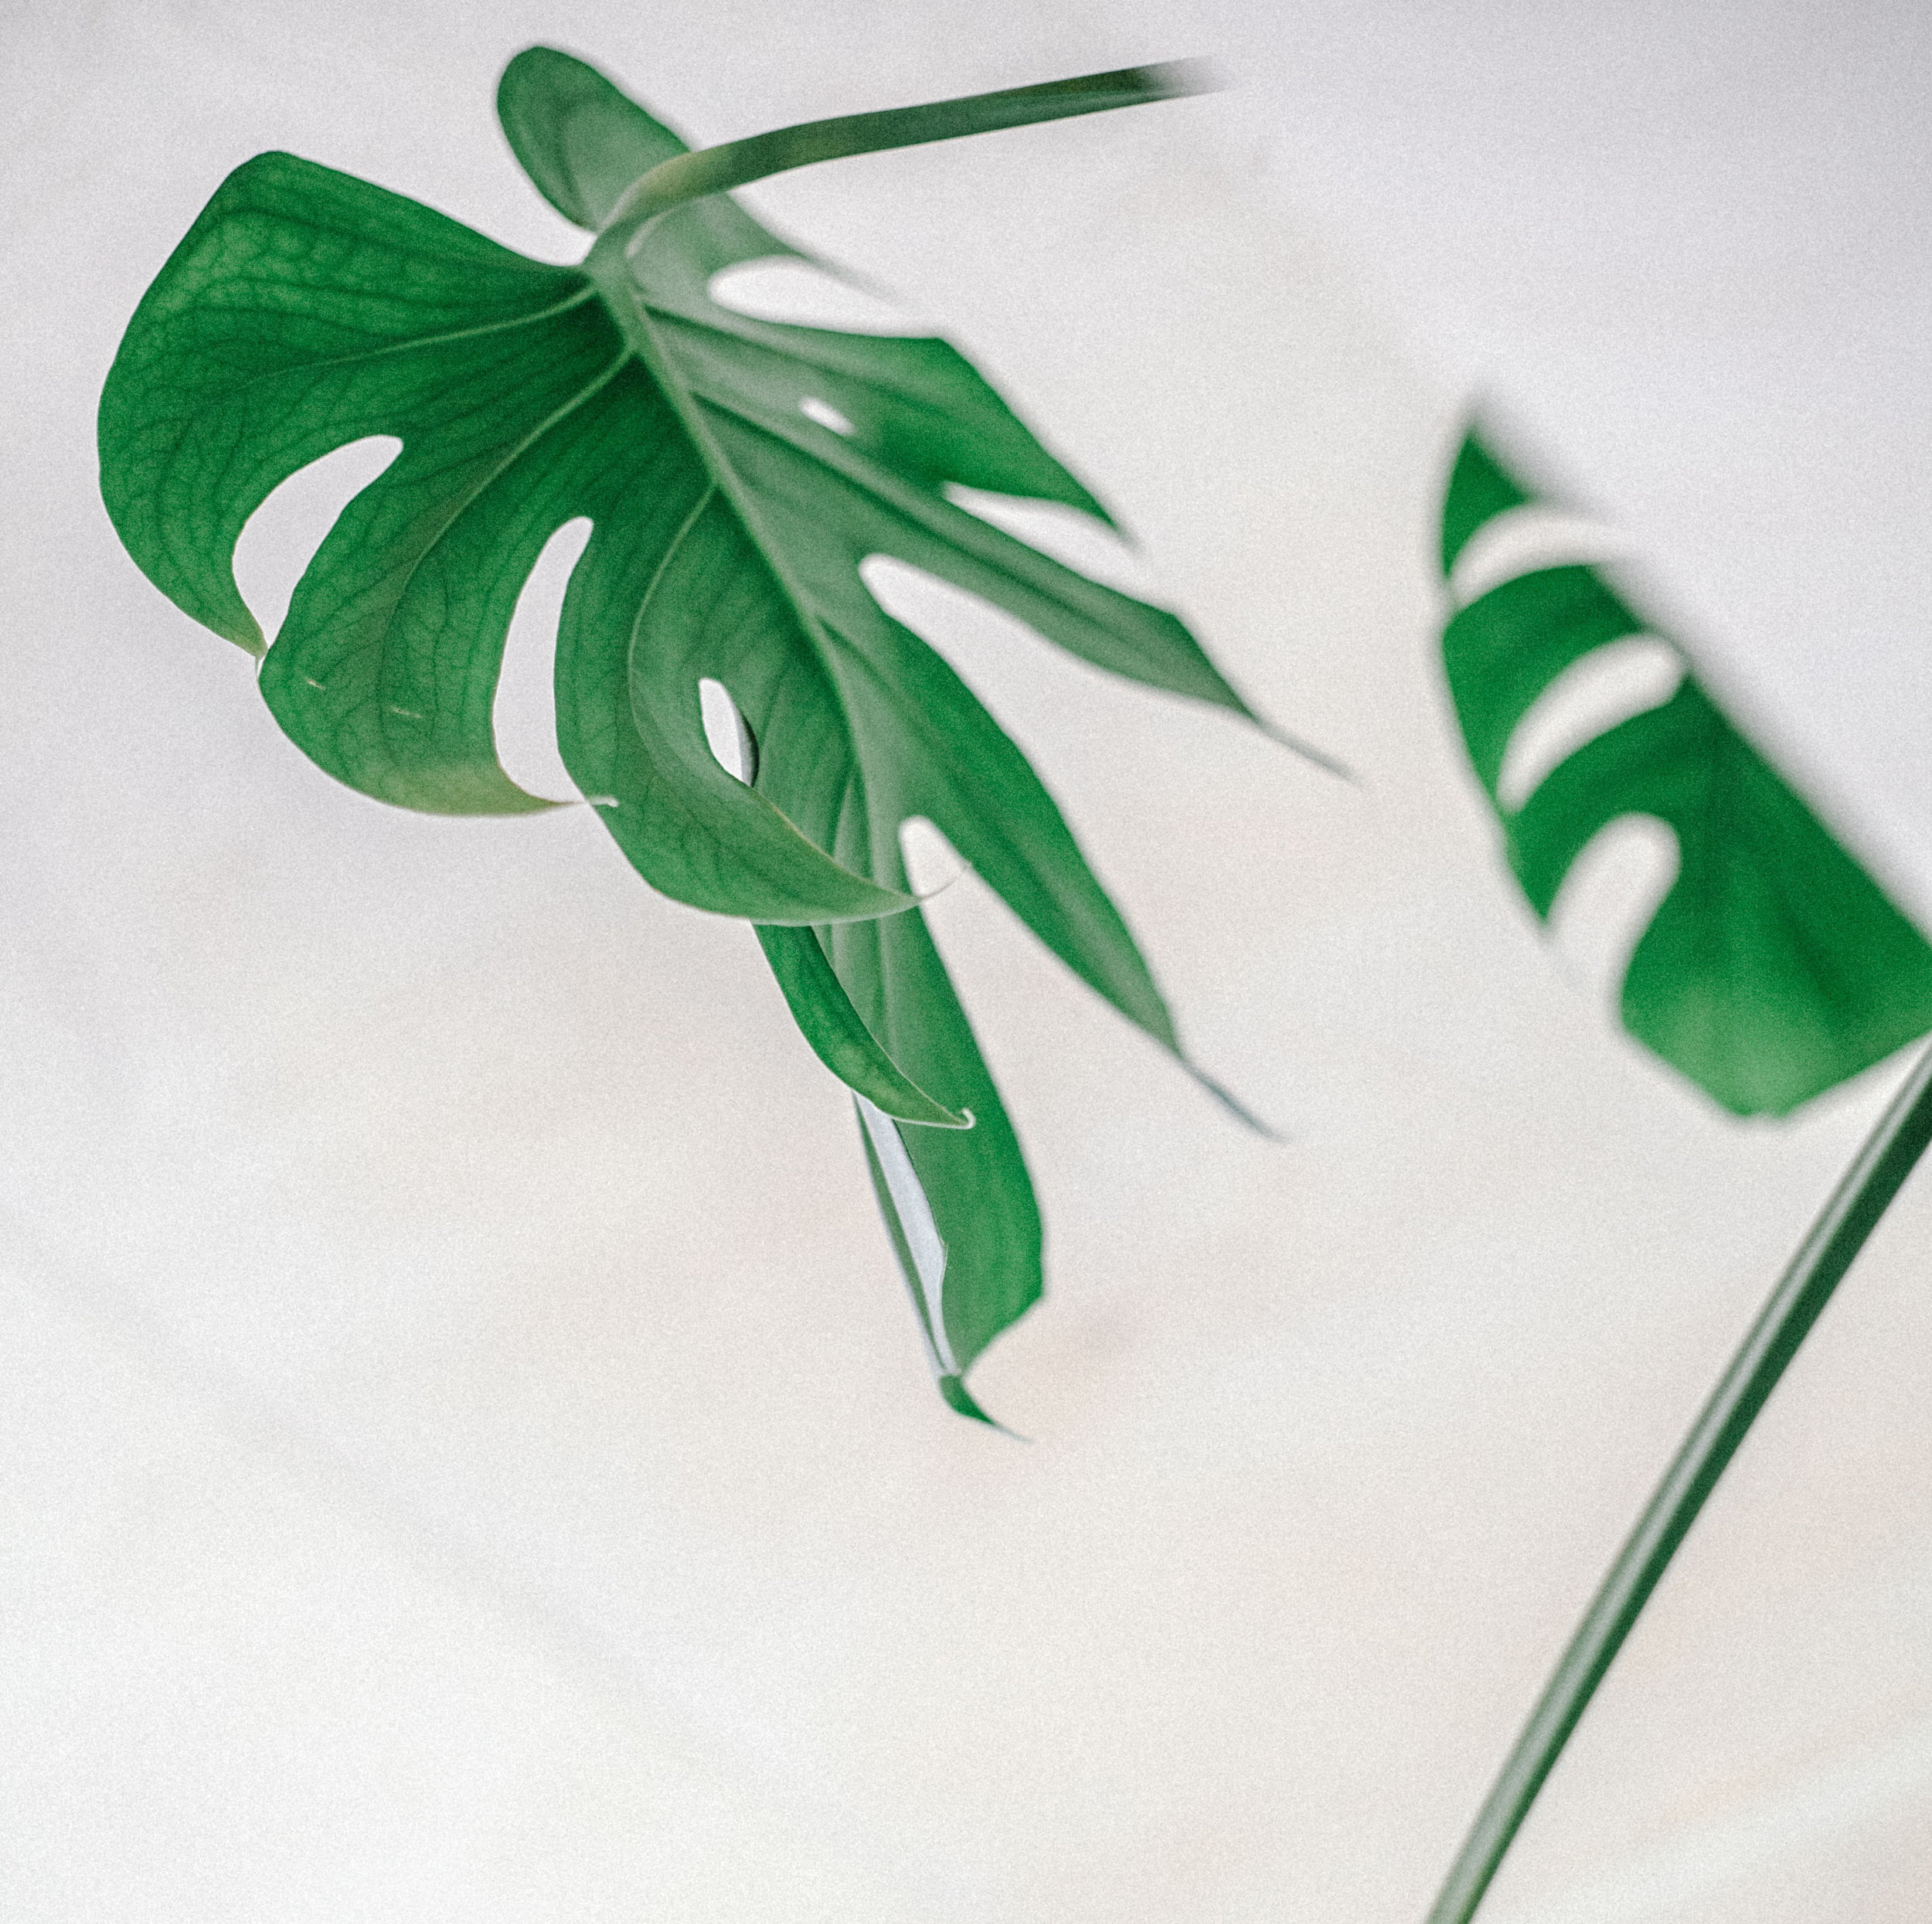 MASAJ Plant2.jpg